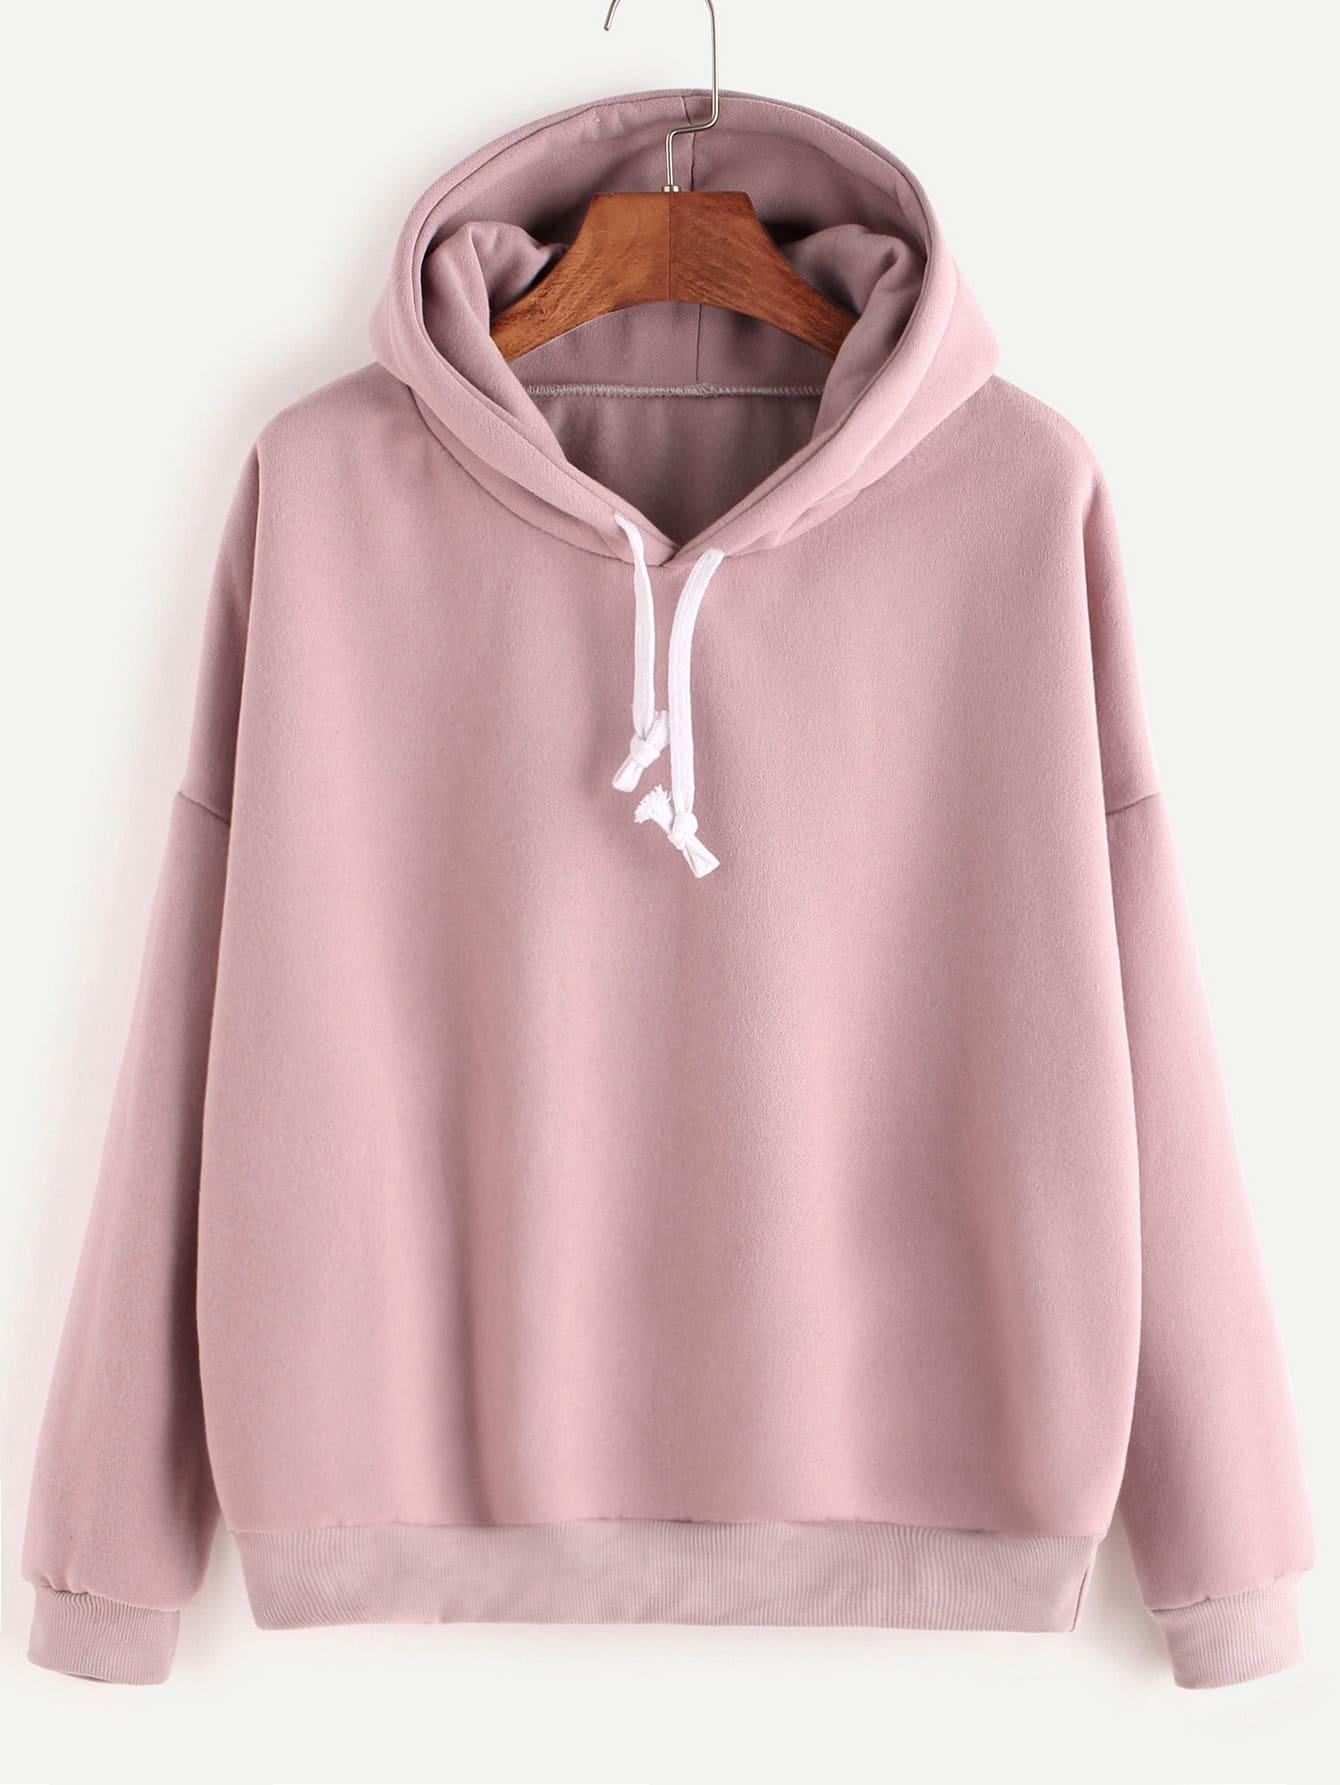 Hooded Drop Shoulder Sweatshirt drop shoulder frilled sleeve sweatshirt